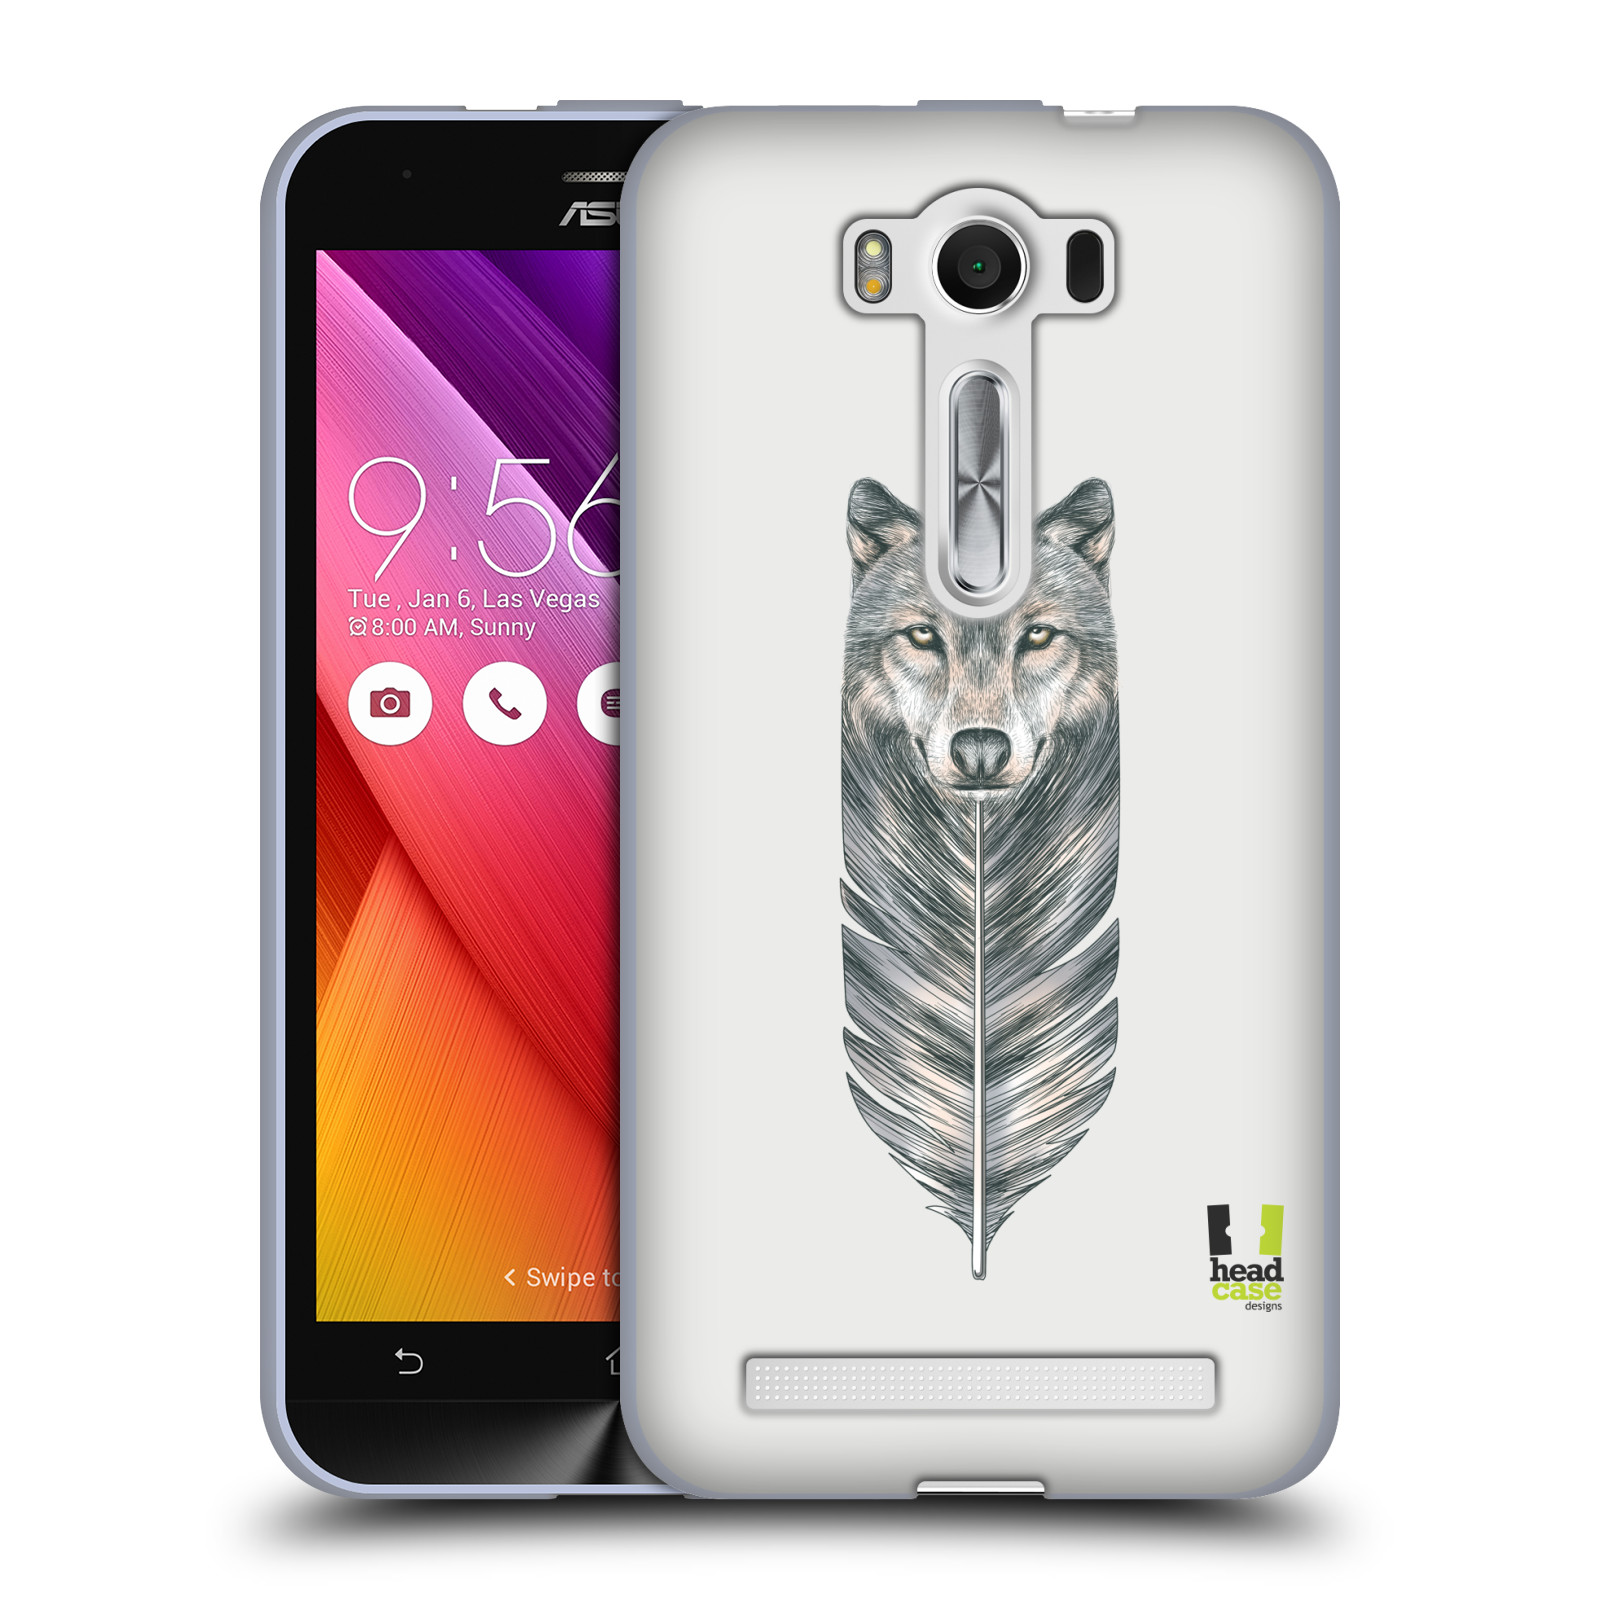 "HEAD CASE silikonový obal na mobil Asus Zenfone 2 LASER (ZE500KL s 5"" displejem) vzor zvířecí pírka vlk"